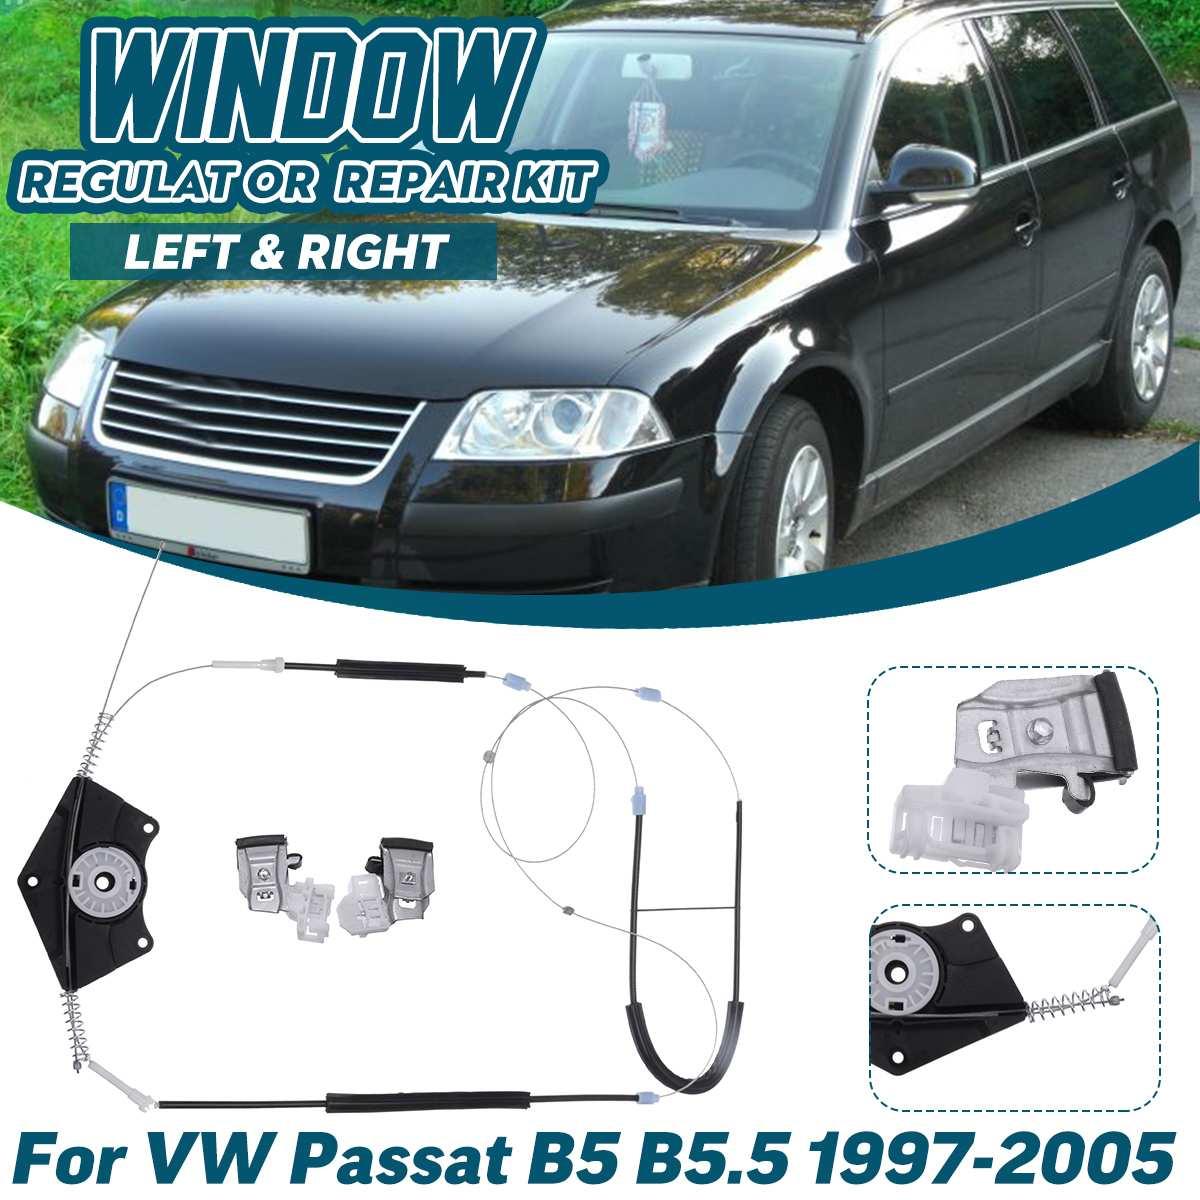 PASSENGER 1999-2000 VW NEW BEETLE ELECTRIC WINDOW REGULATOR REPAIR KIT LEFT